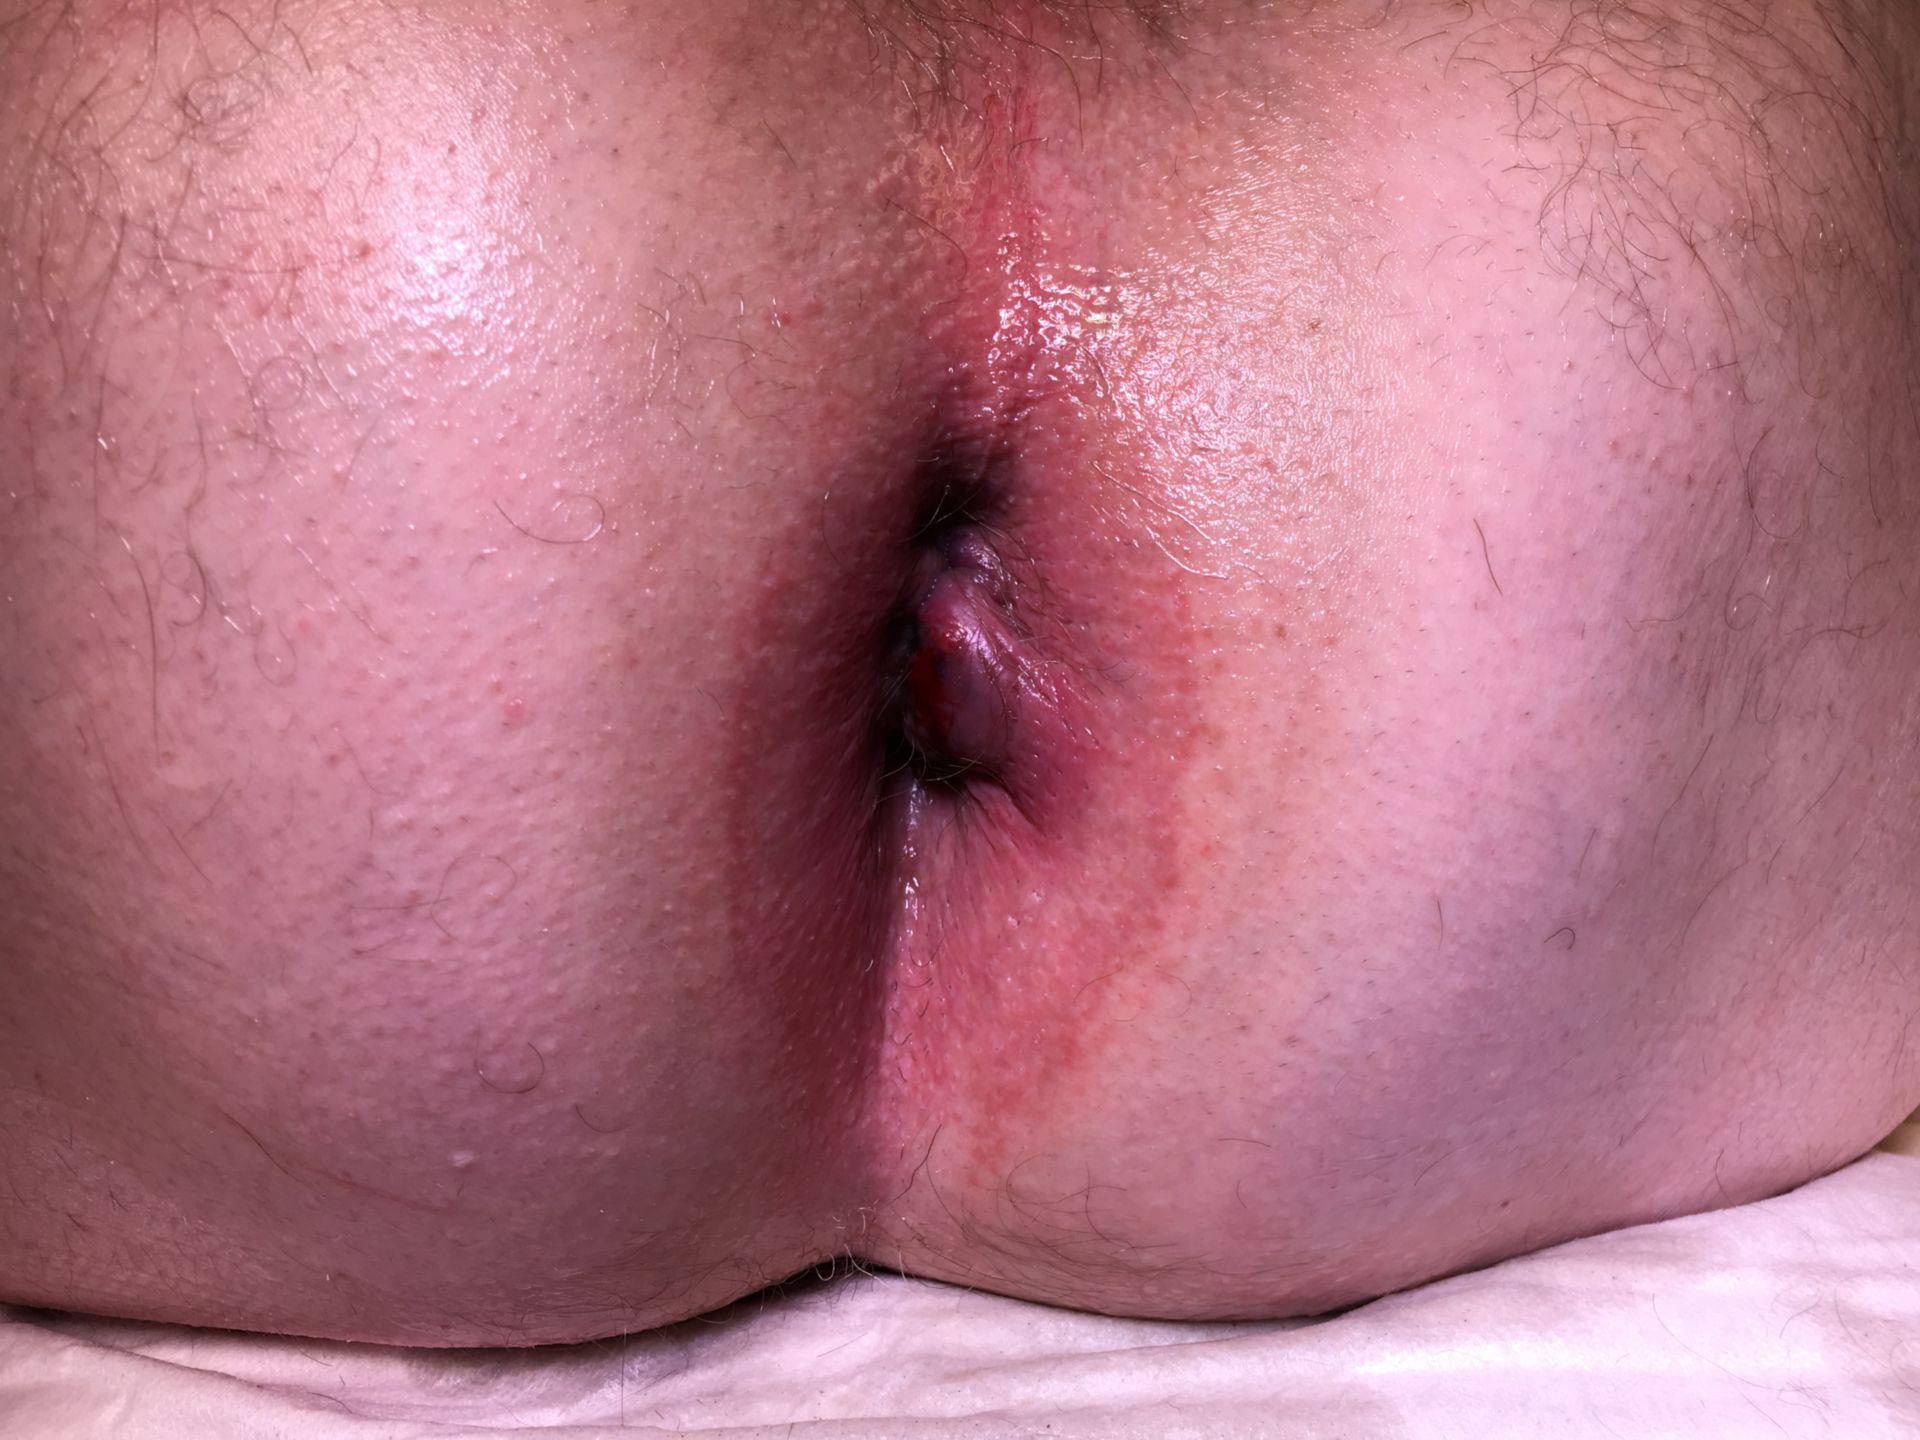 Hämorrhoide oder Analvenenthrombose ?